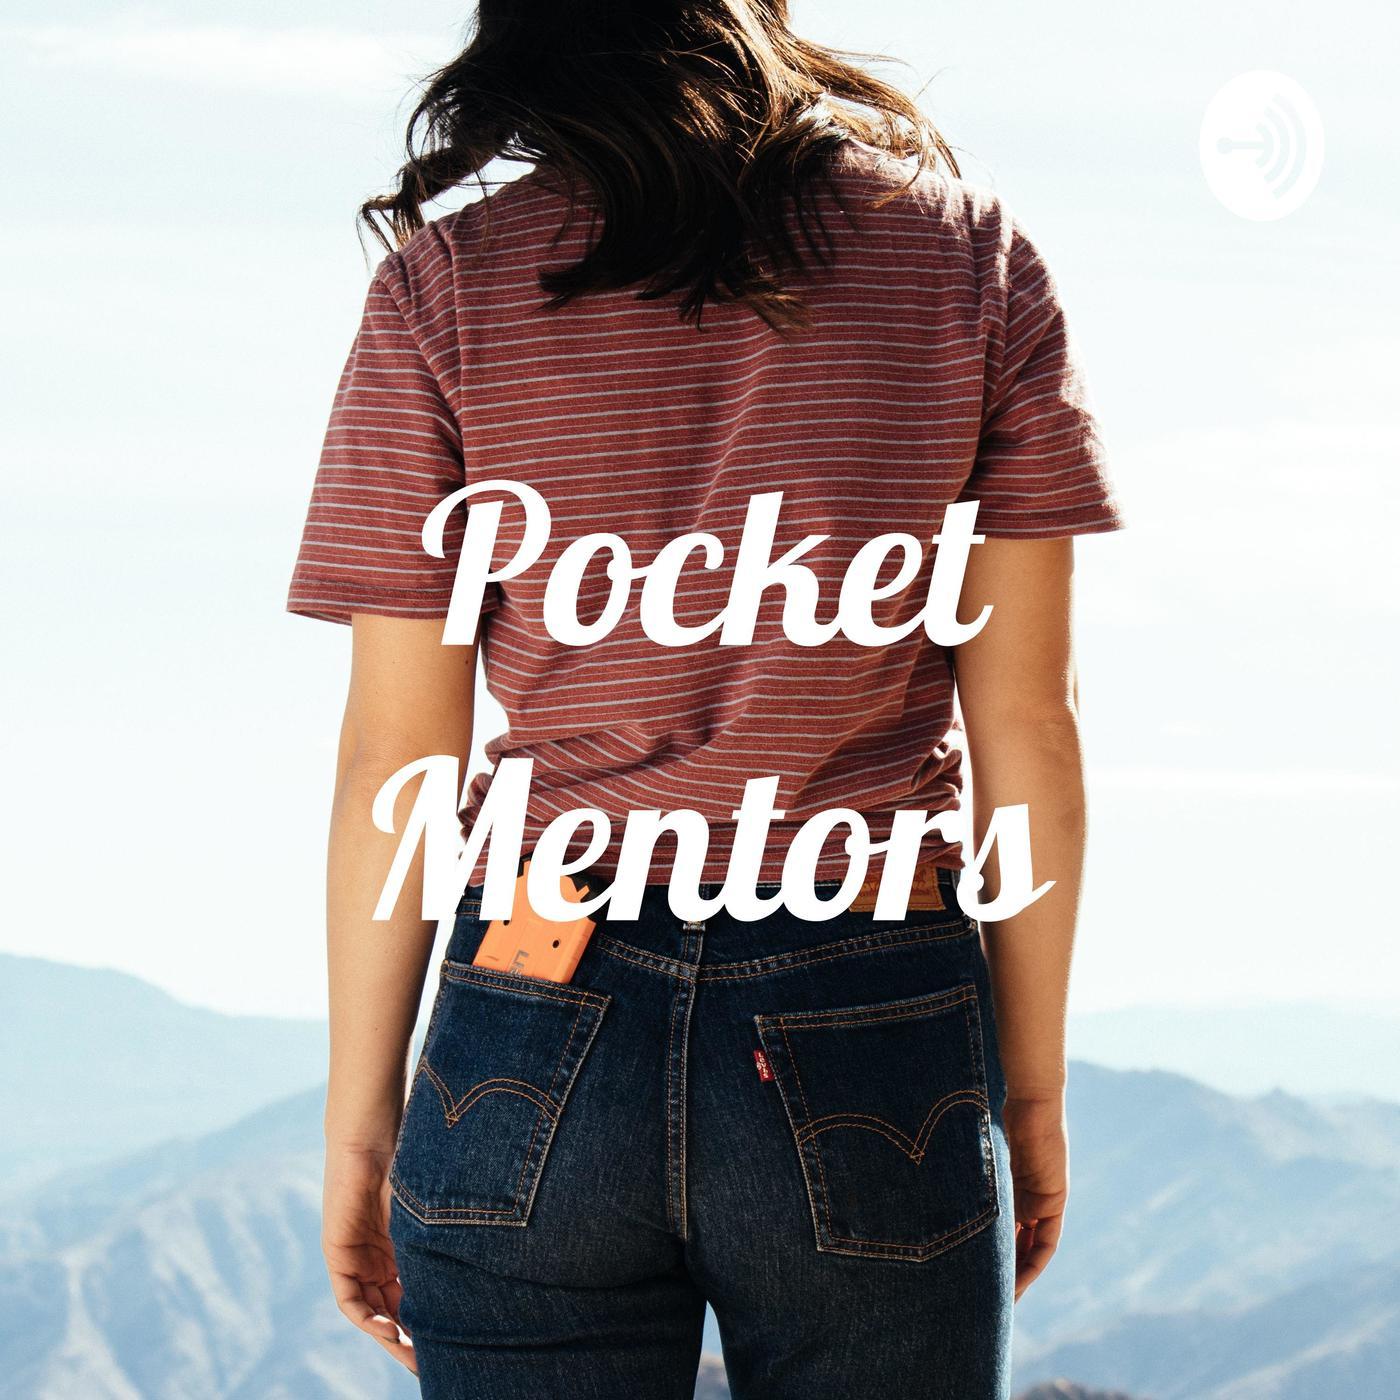 Pocket Mentors Podcast with Lorraine Dallmeier